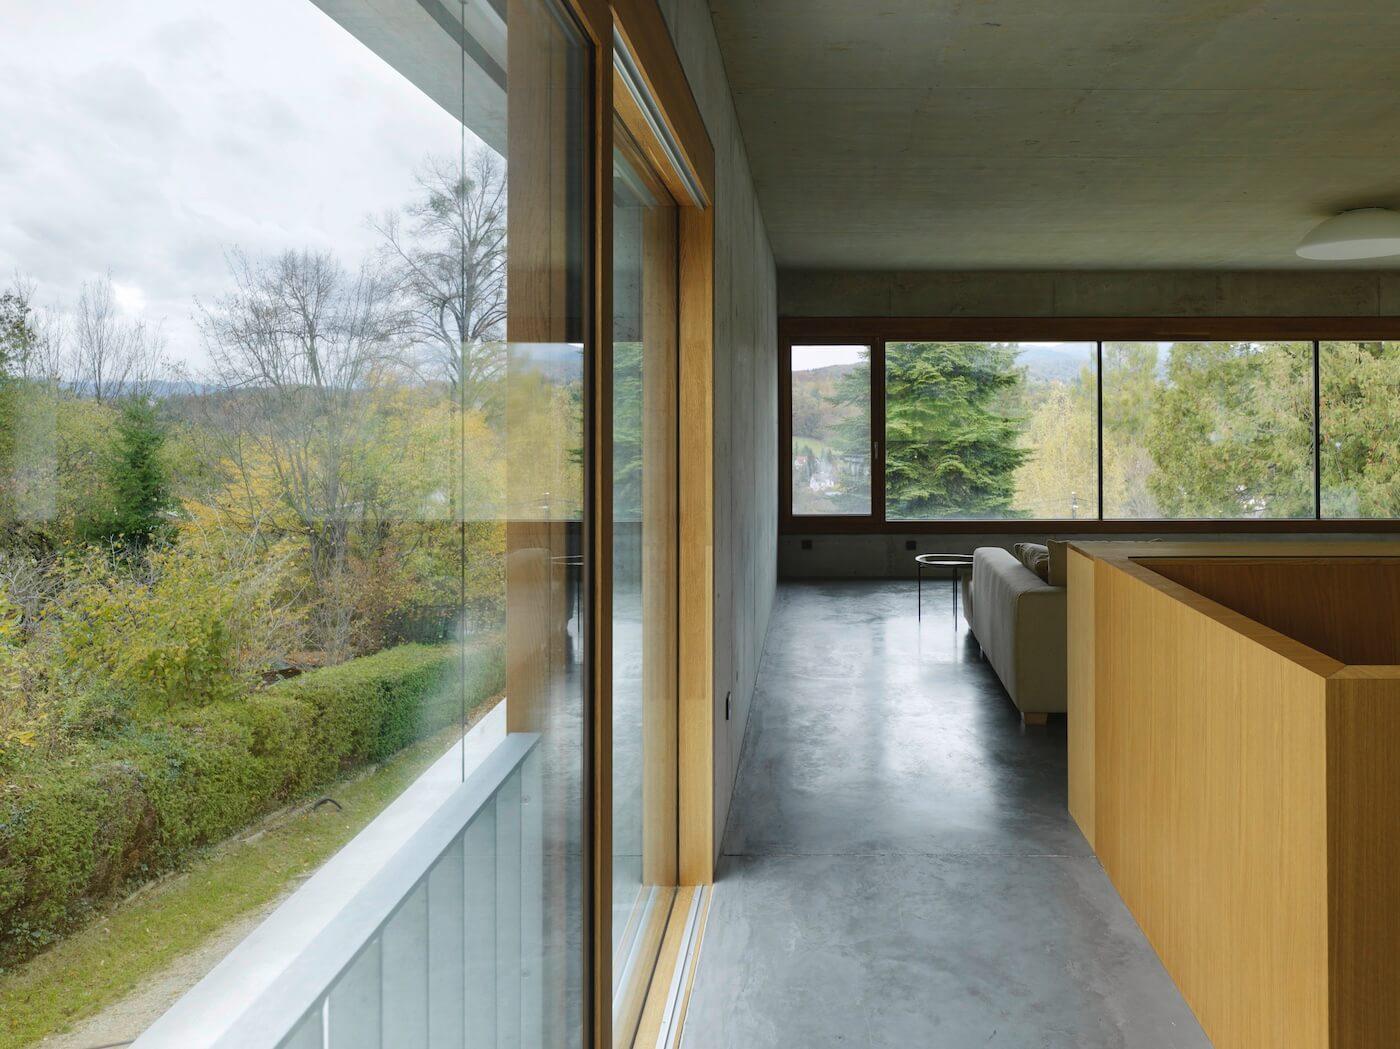 Einfamilienhaus Graz Wohnbeton (wohnbeton.info)